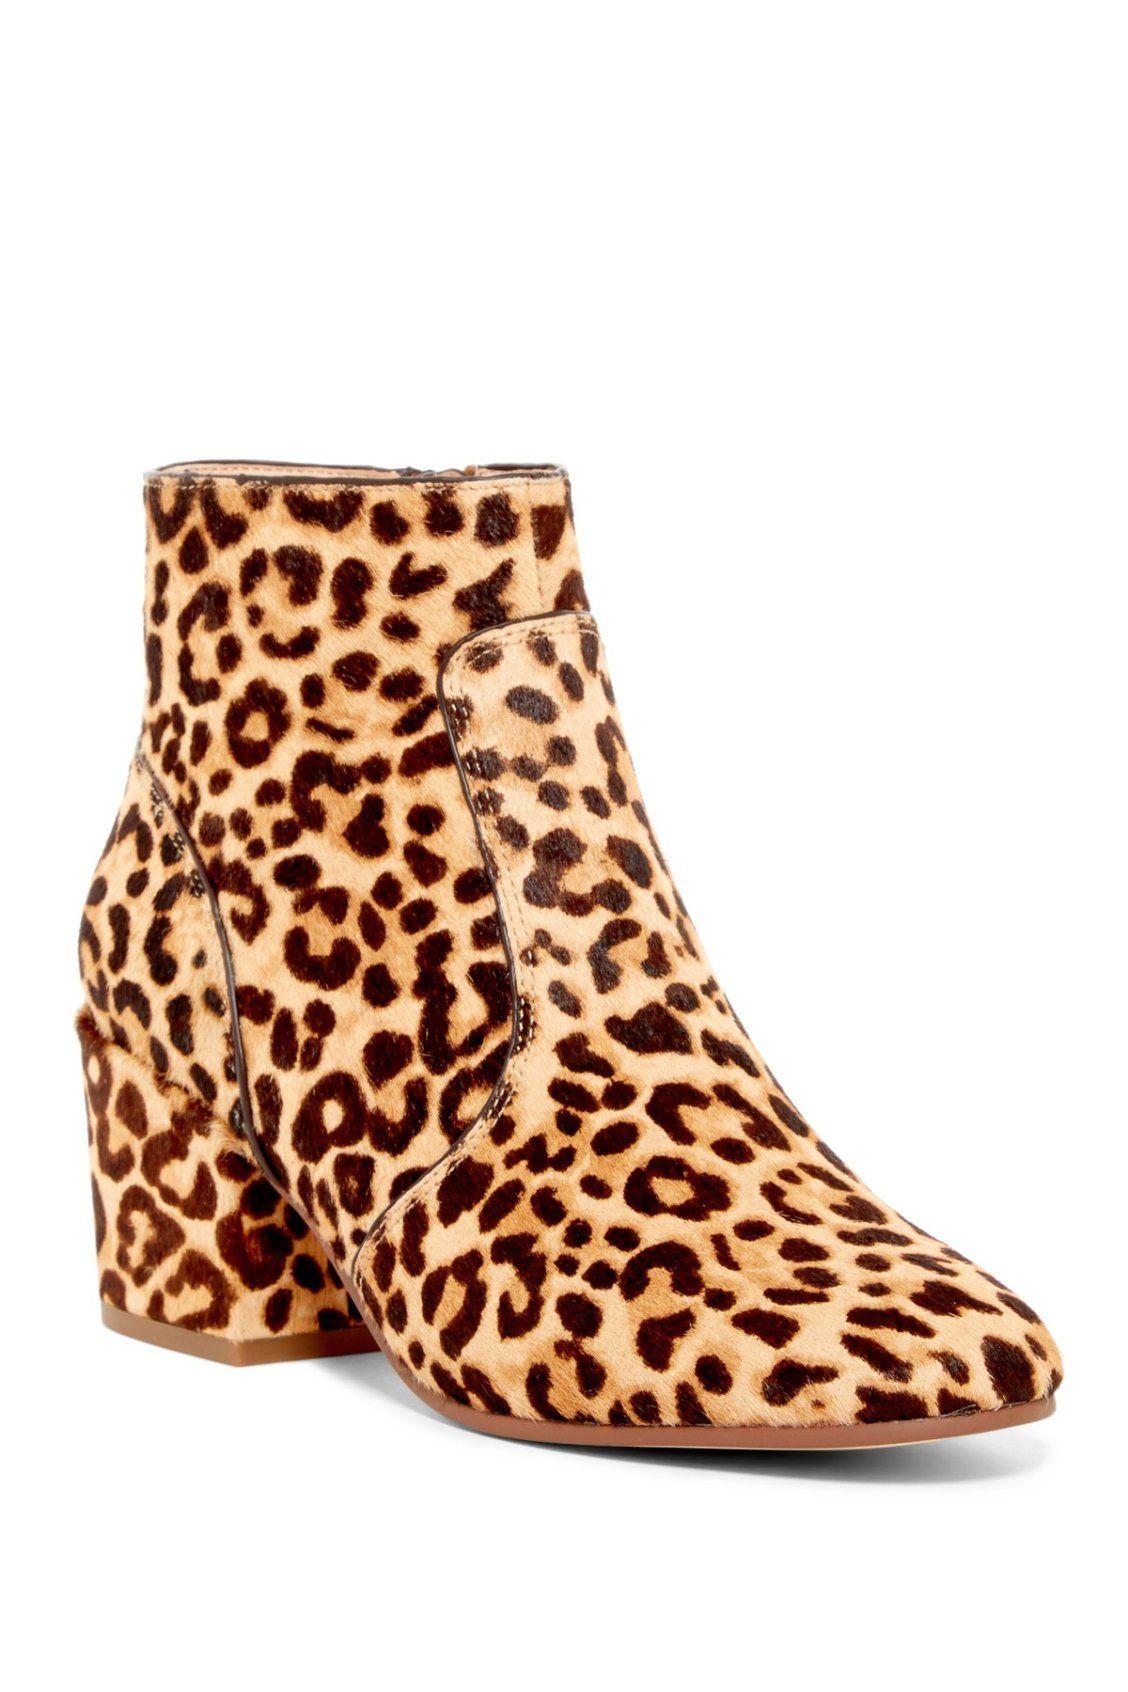 Clean And Classic Tamara Mellon Leather Sandals Leopard Print Jungle Fever Leopard print